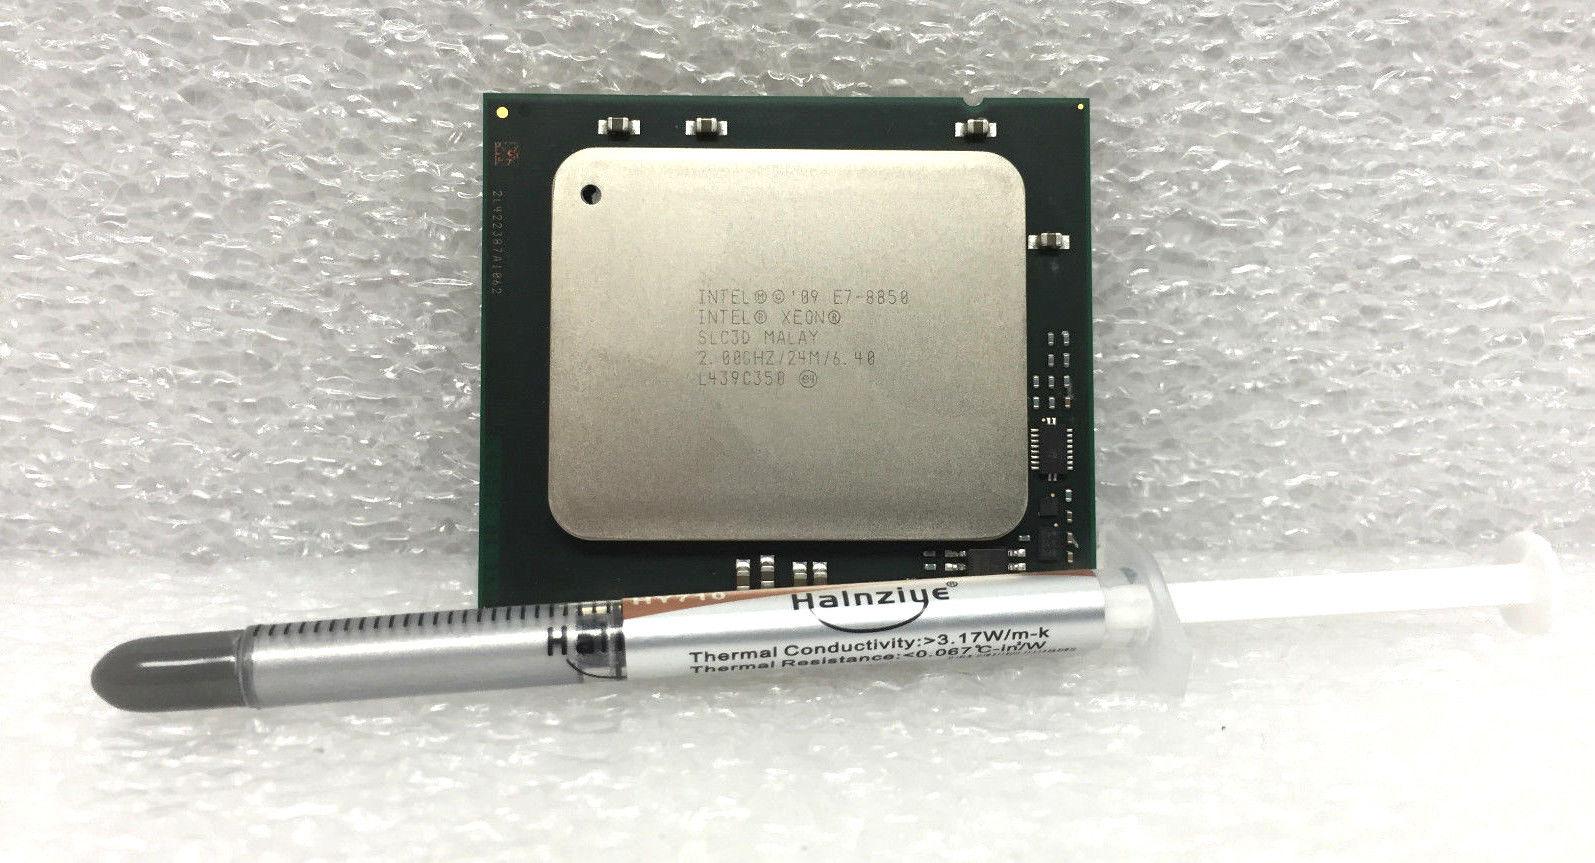 Intel Xeon E7-8850 2.0GHz 10 Core 24MB LGA 1567 Processor (SLC3D)